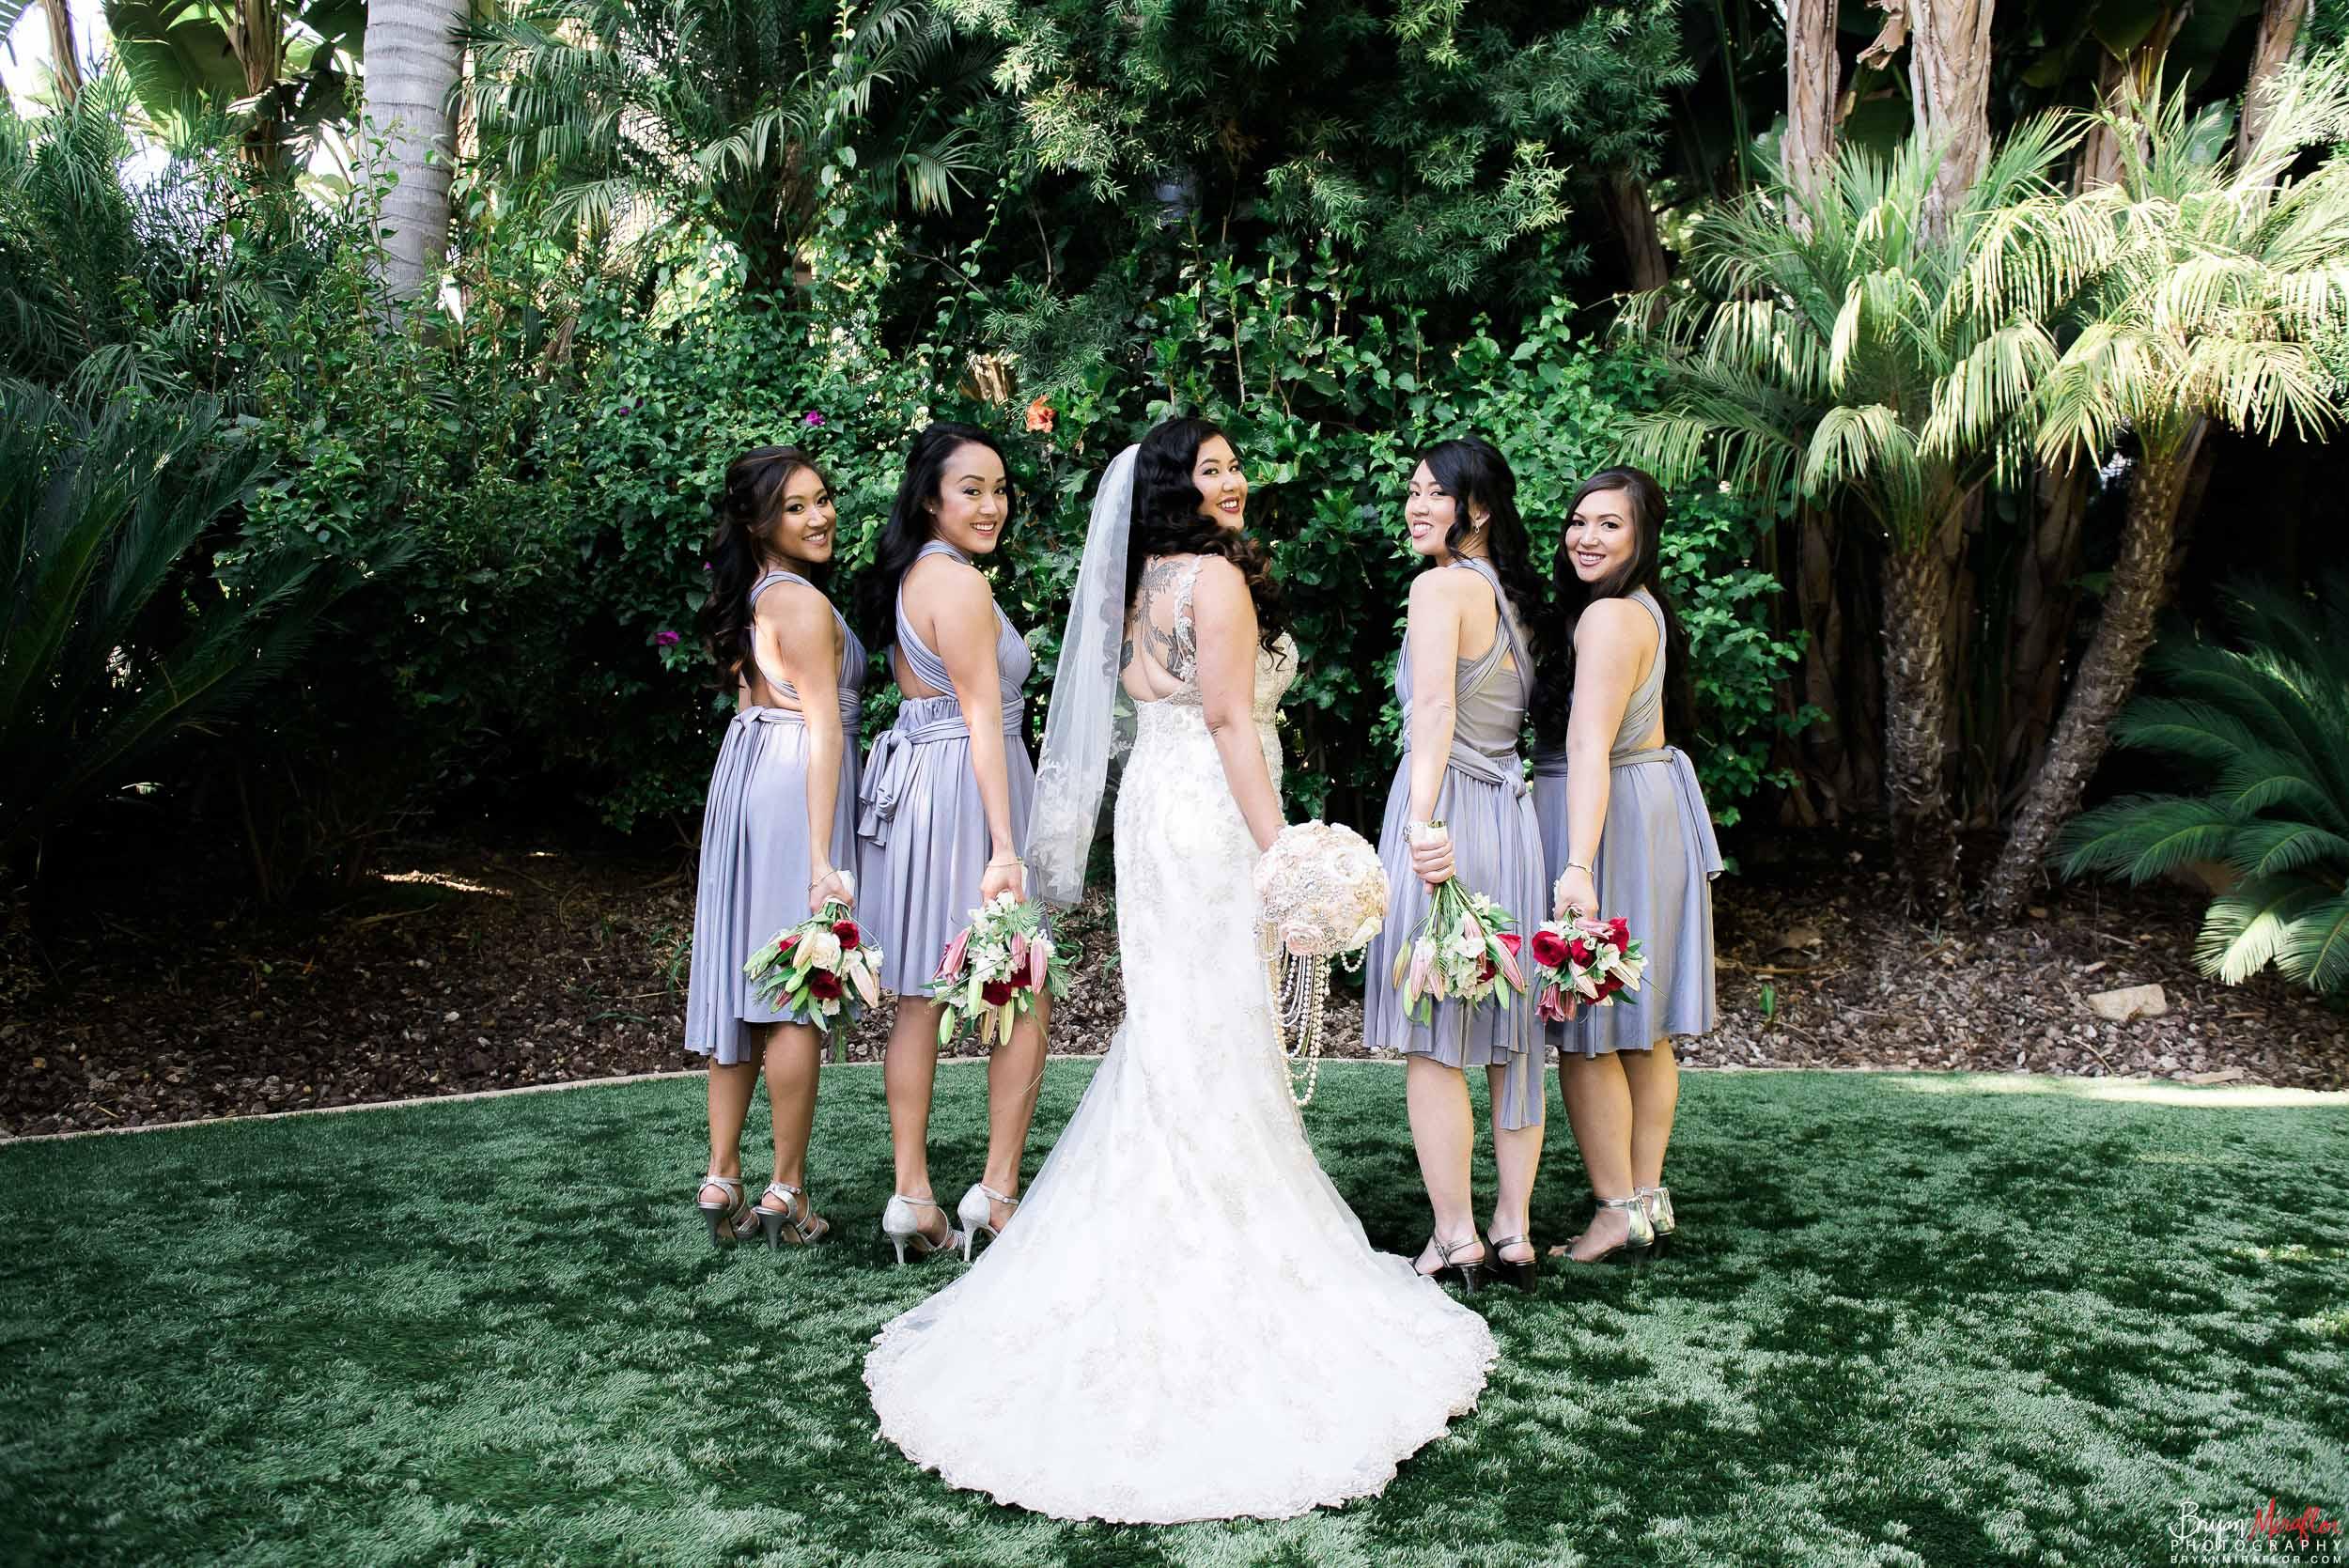 Bryan-Miraflor-Photography-Hannah-Jonathan-Married-Grand-Traditions-Estate-Gardens-Fallbrook-20171222-127.jpg